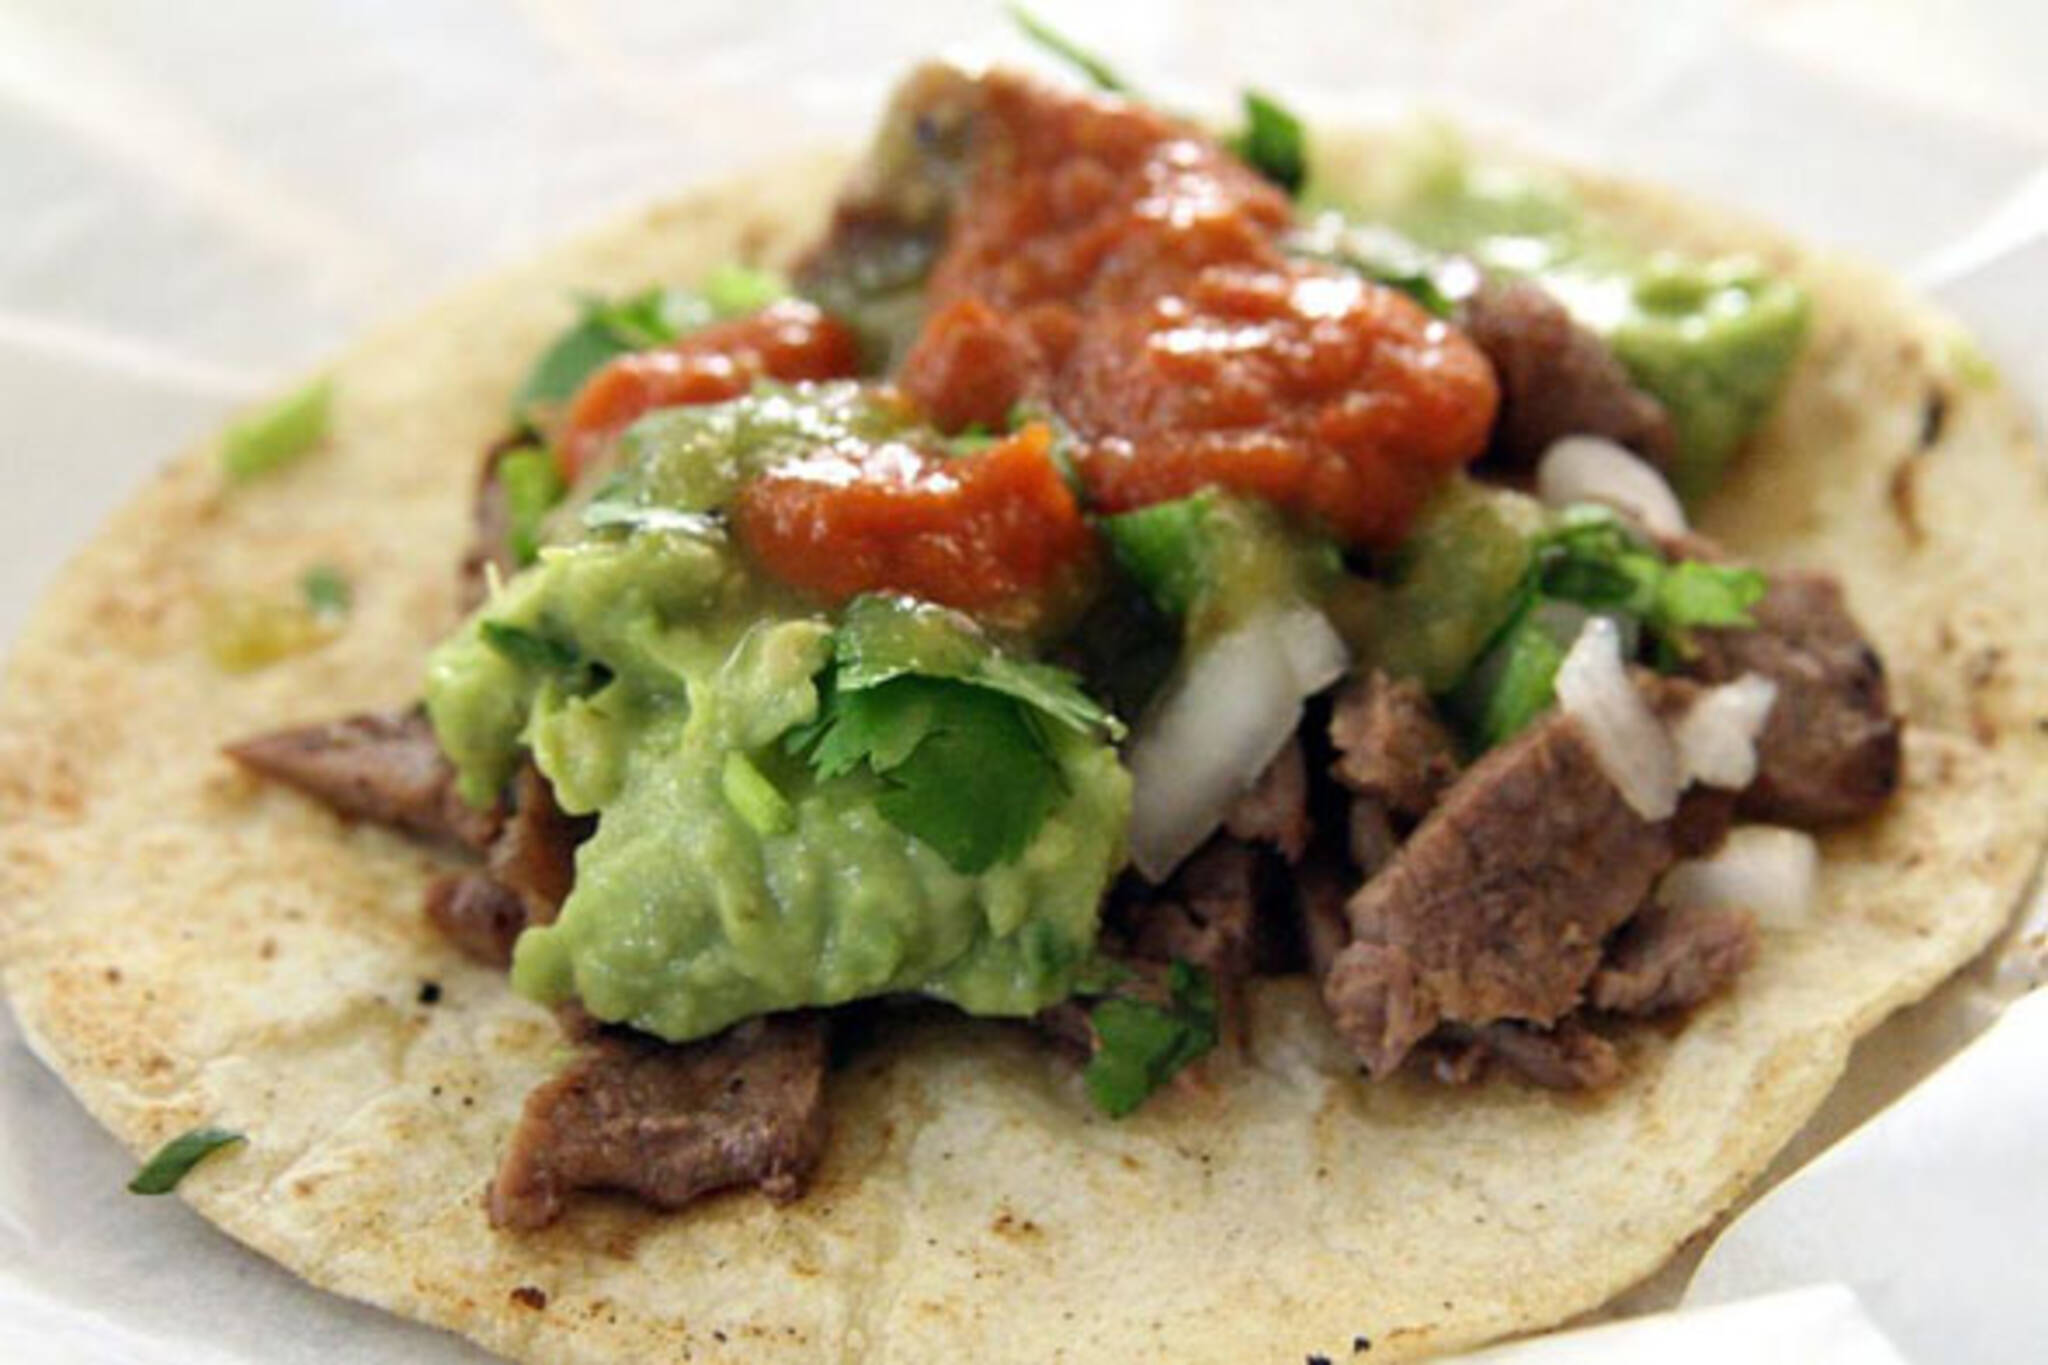 Mexican Food On Daniel Fast